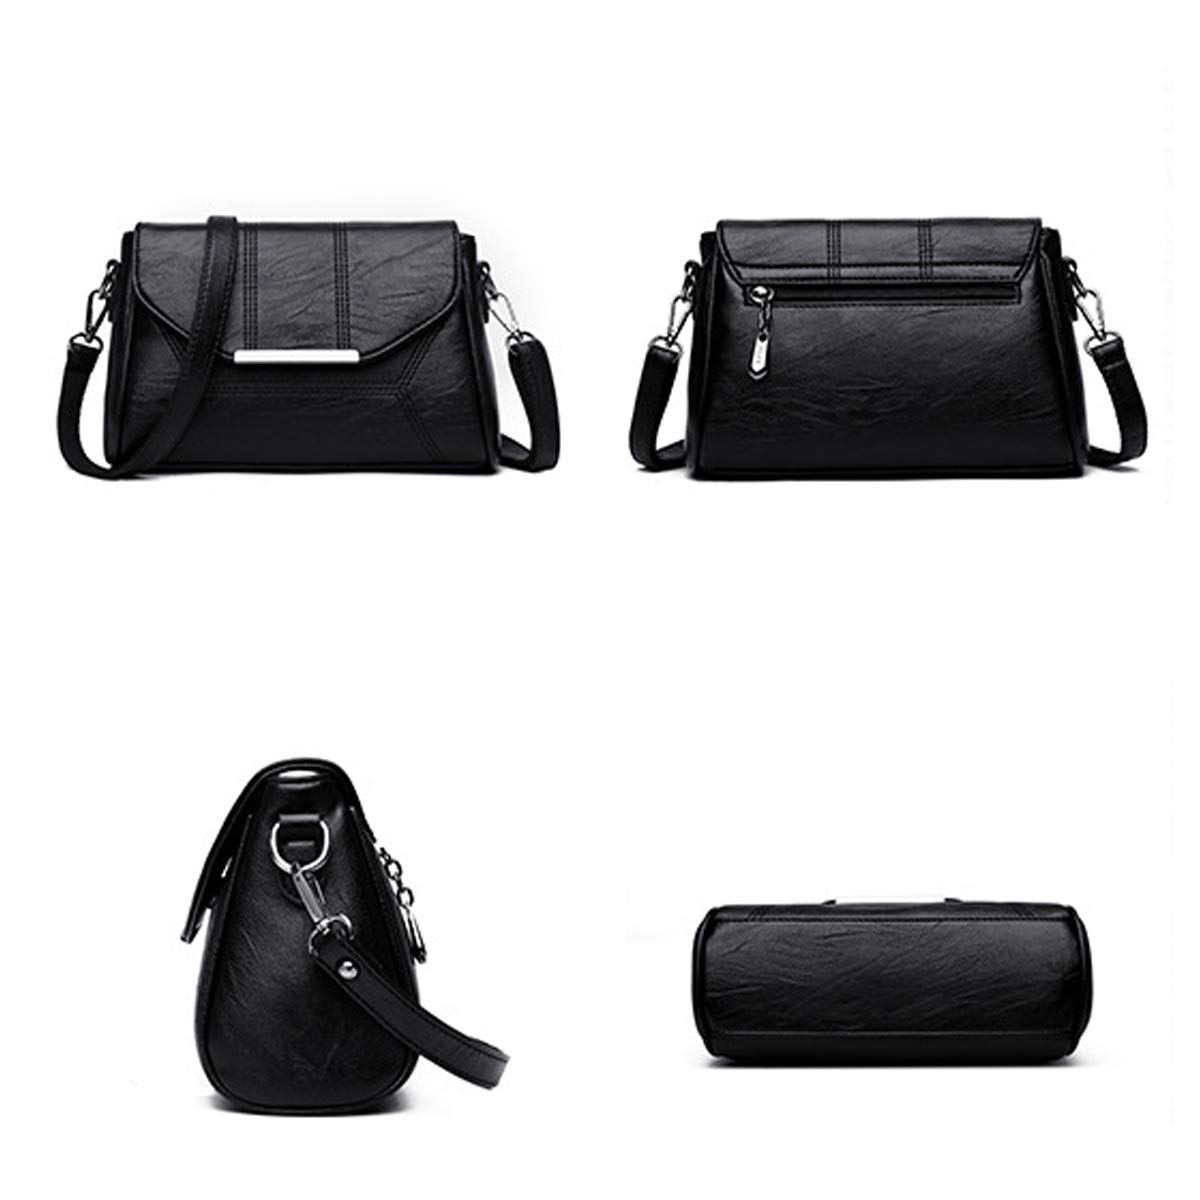 65dff680e337b ... Damen Shopper Shopper Shopper Tasche Umhängetasche EXULL-8088 Mittel  Schultertasche PU Leder Handtasche Frauen Reisetasche ...